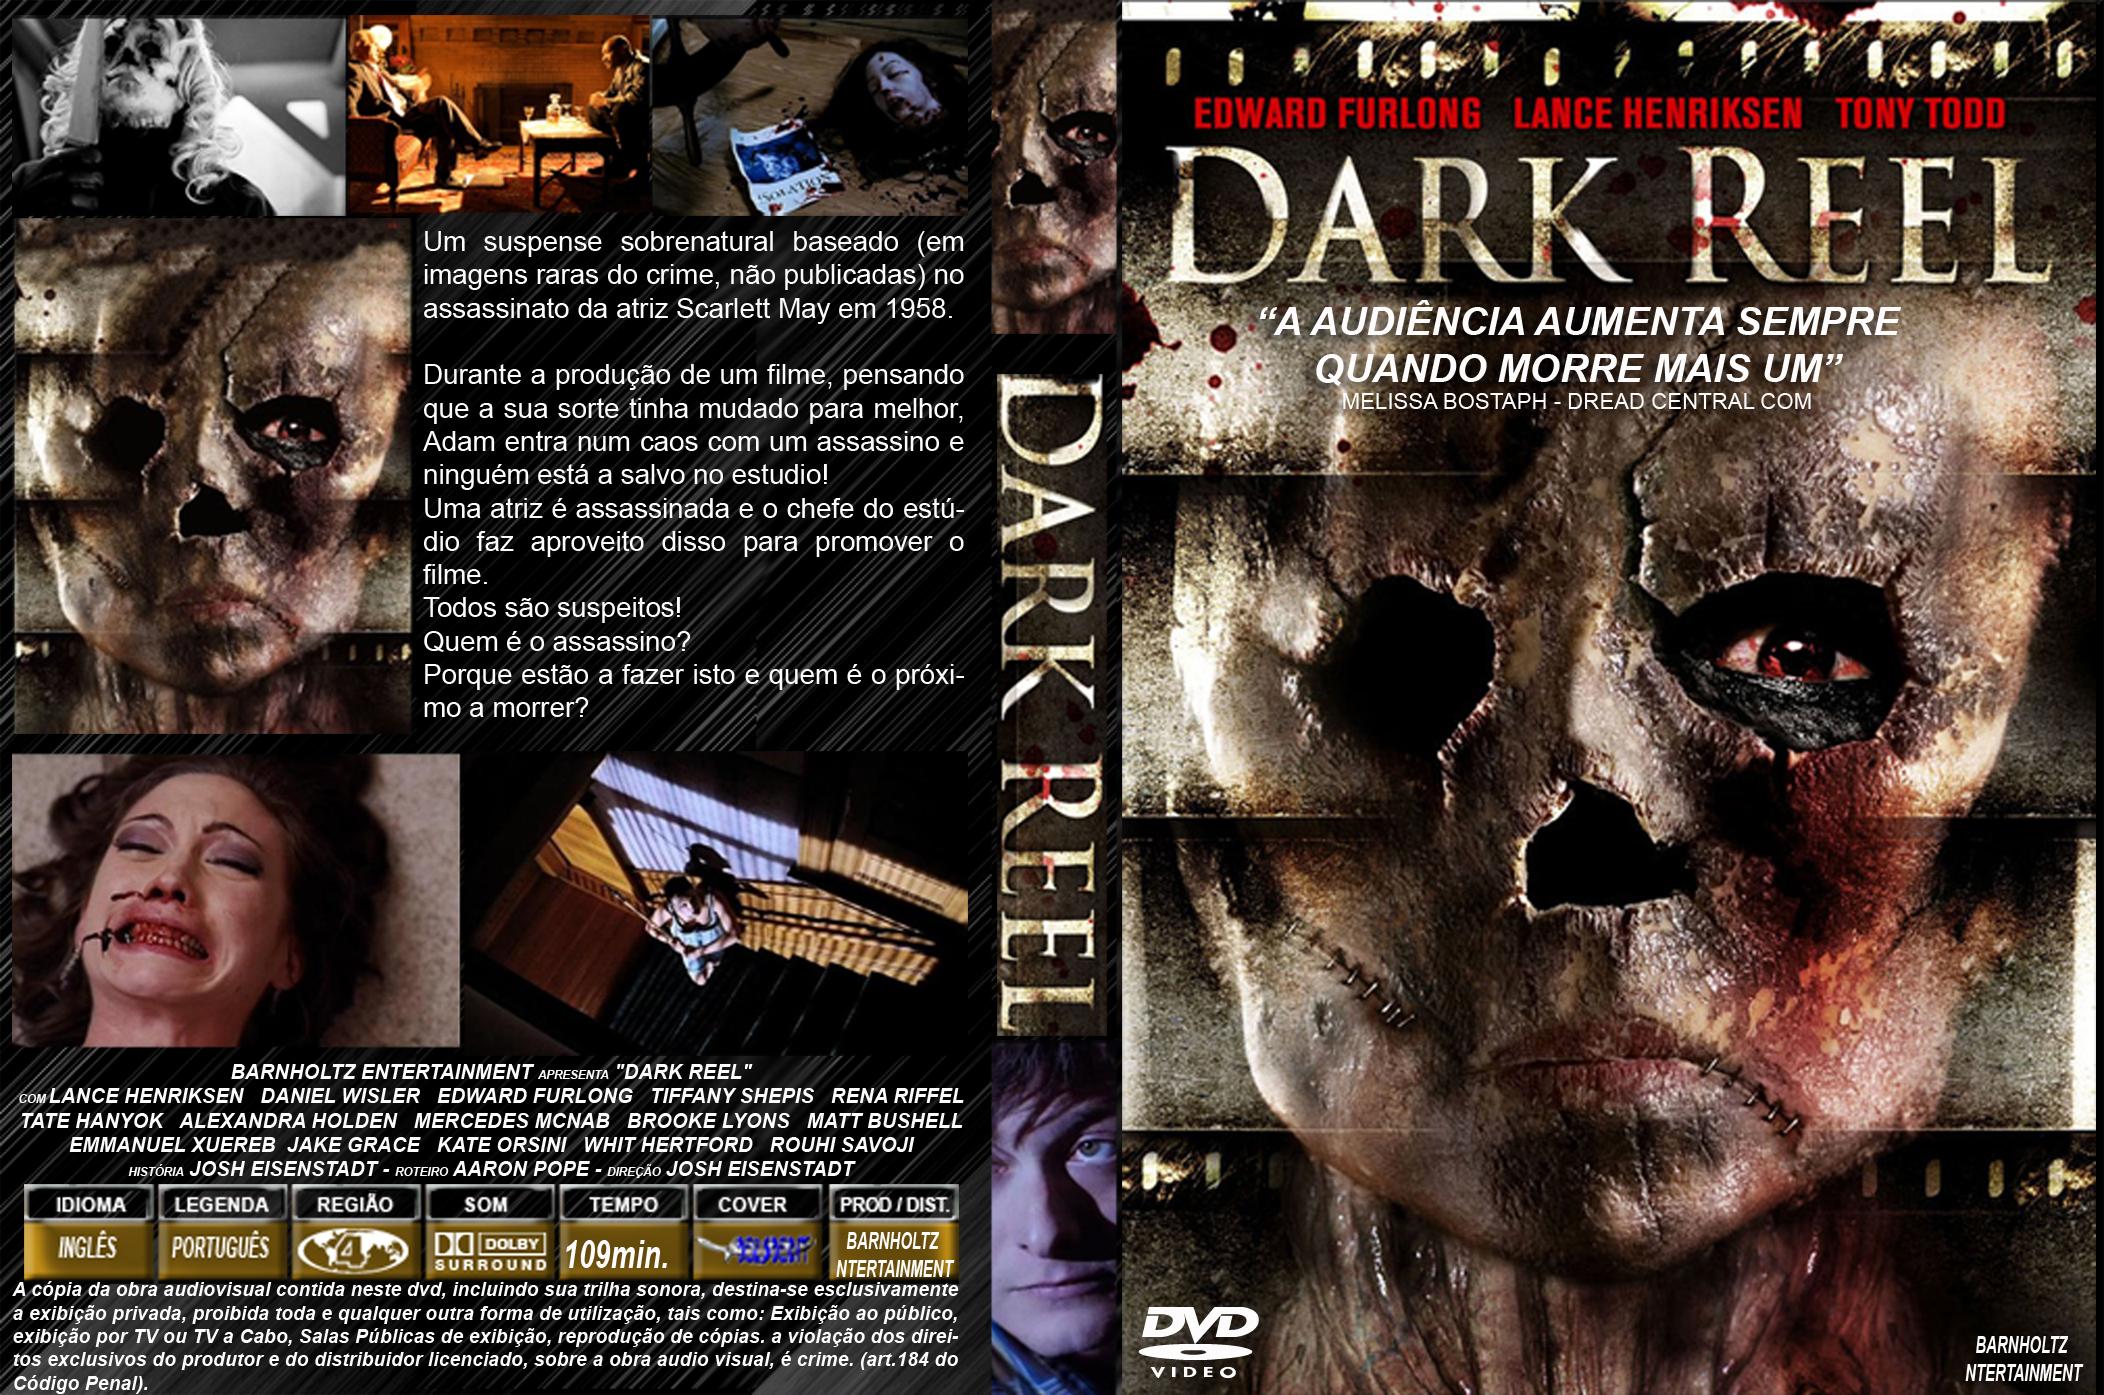 DarkReel